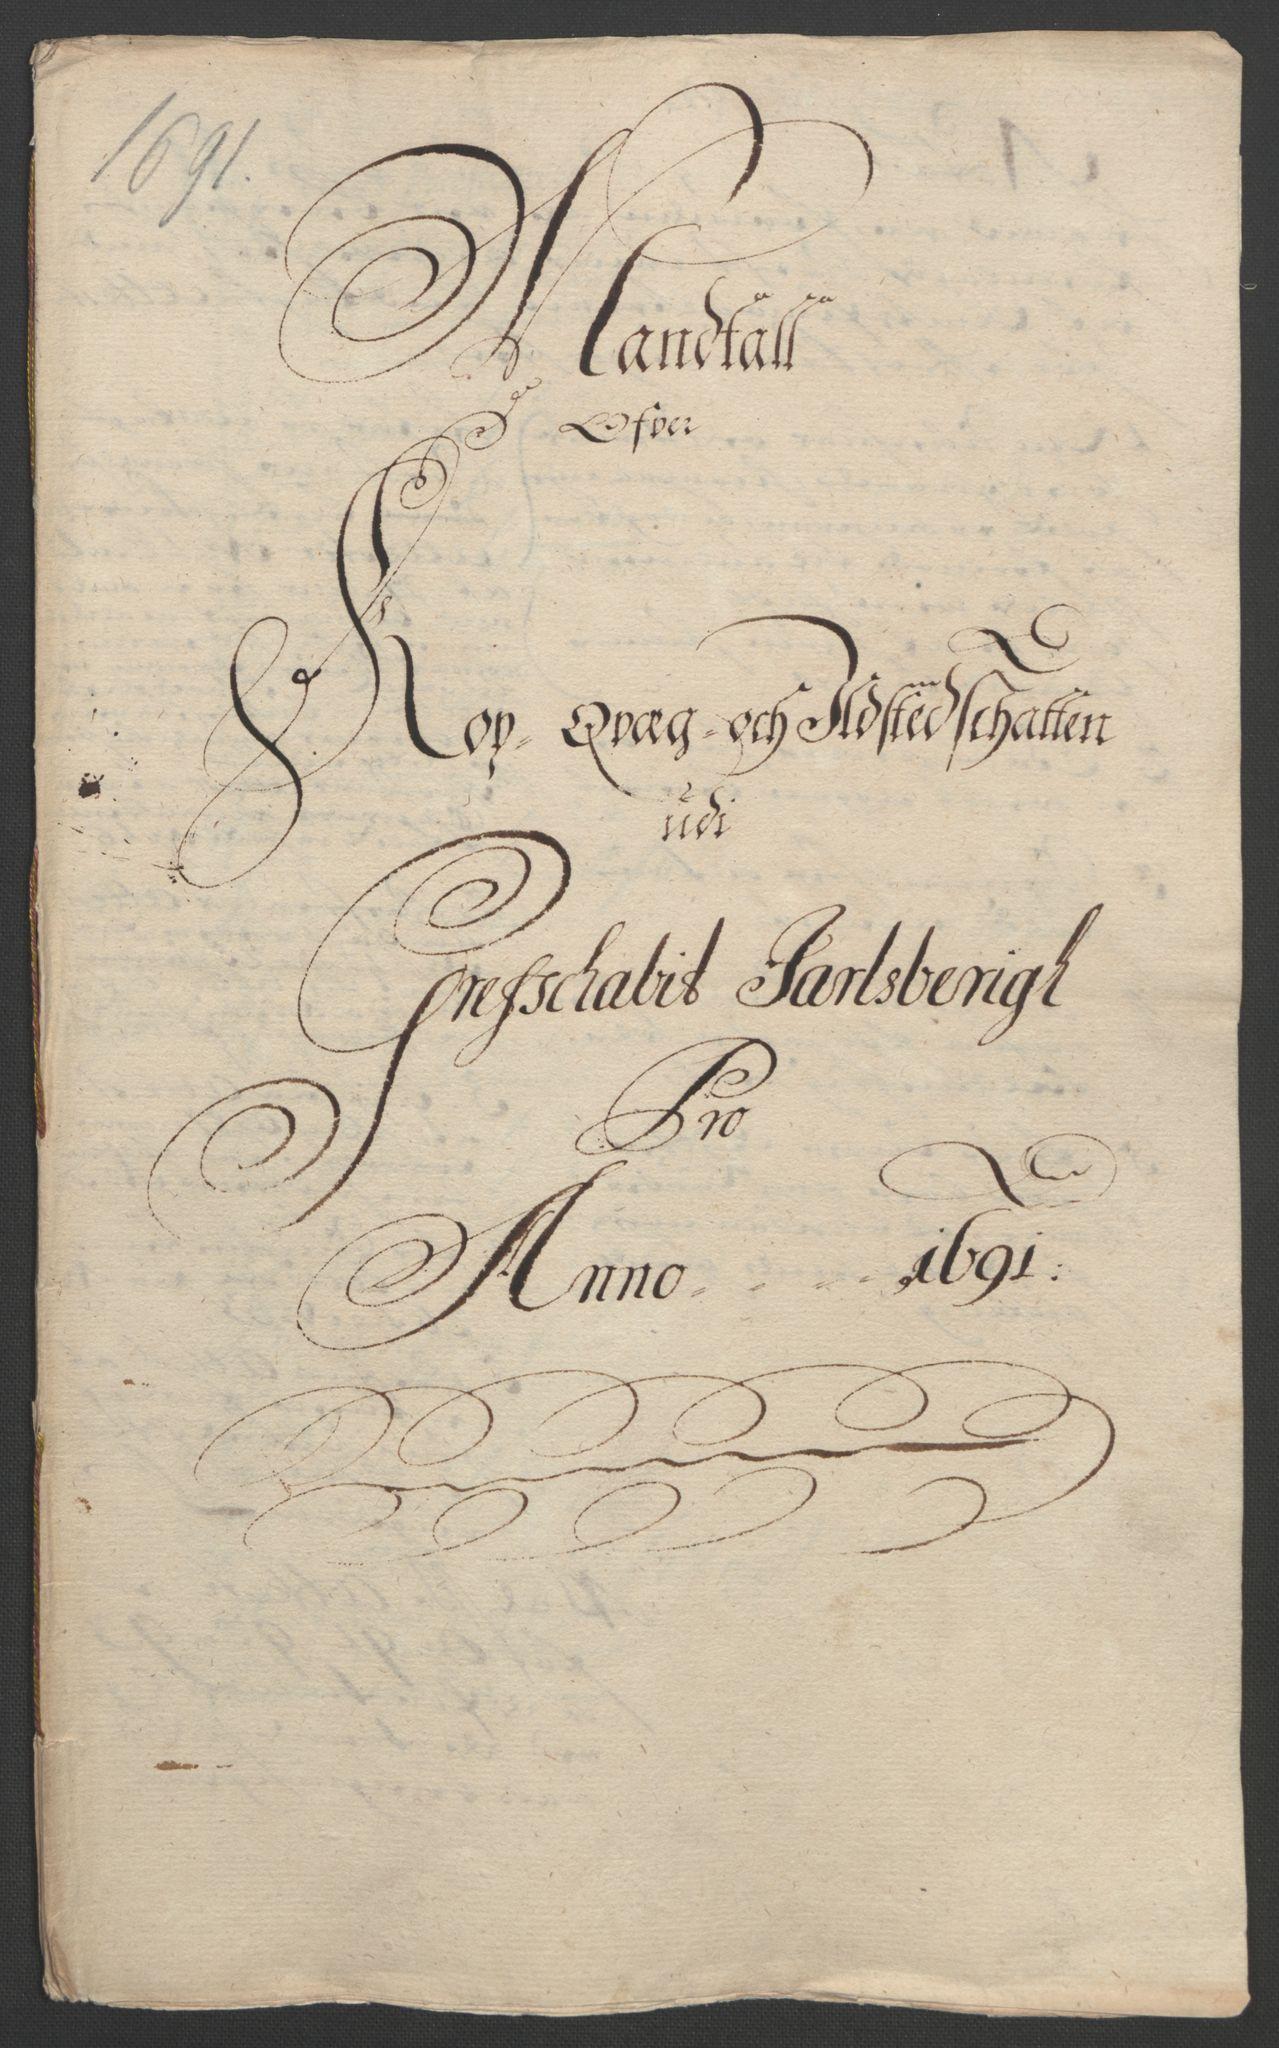 RA, Rentekammeret inntil 1814, Reviderte regnskaper, Fogderegnskap, R32/L1864: Fogderegnskap Jarlsberg grevskap, 1691, s. 161